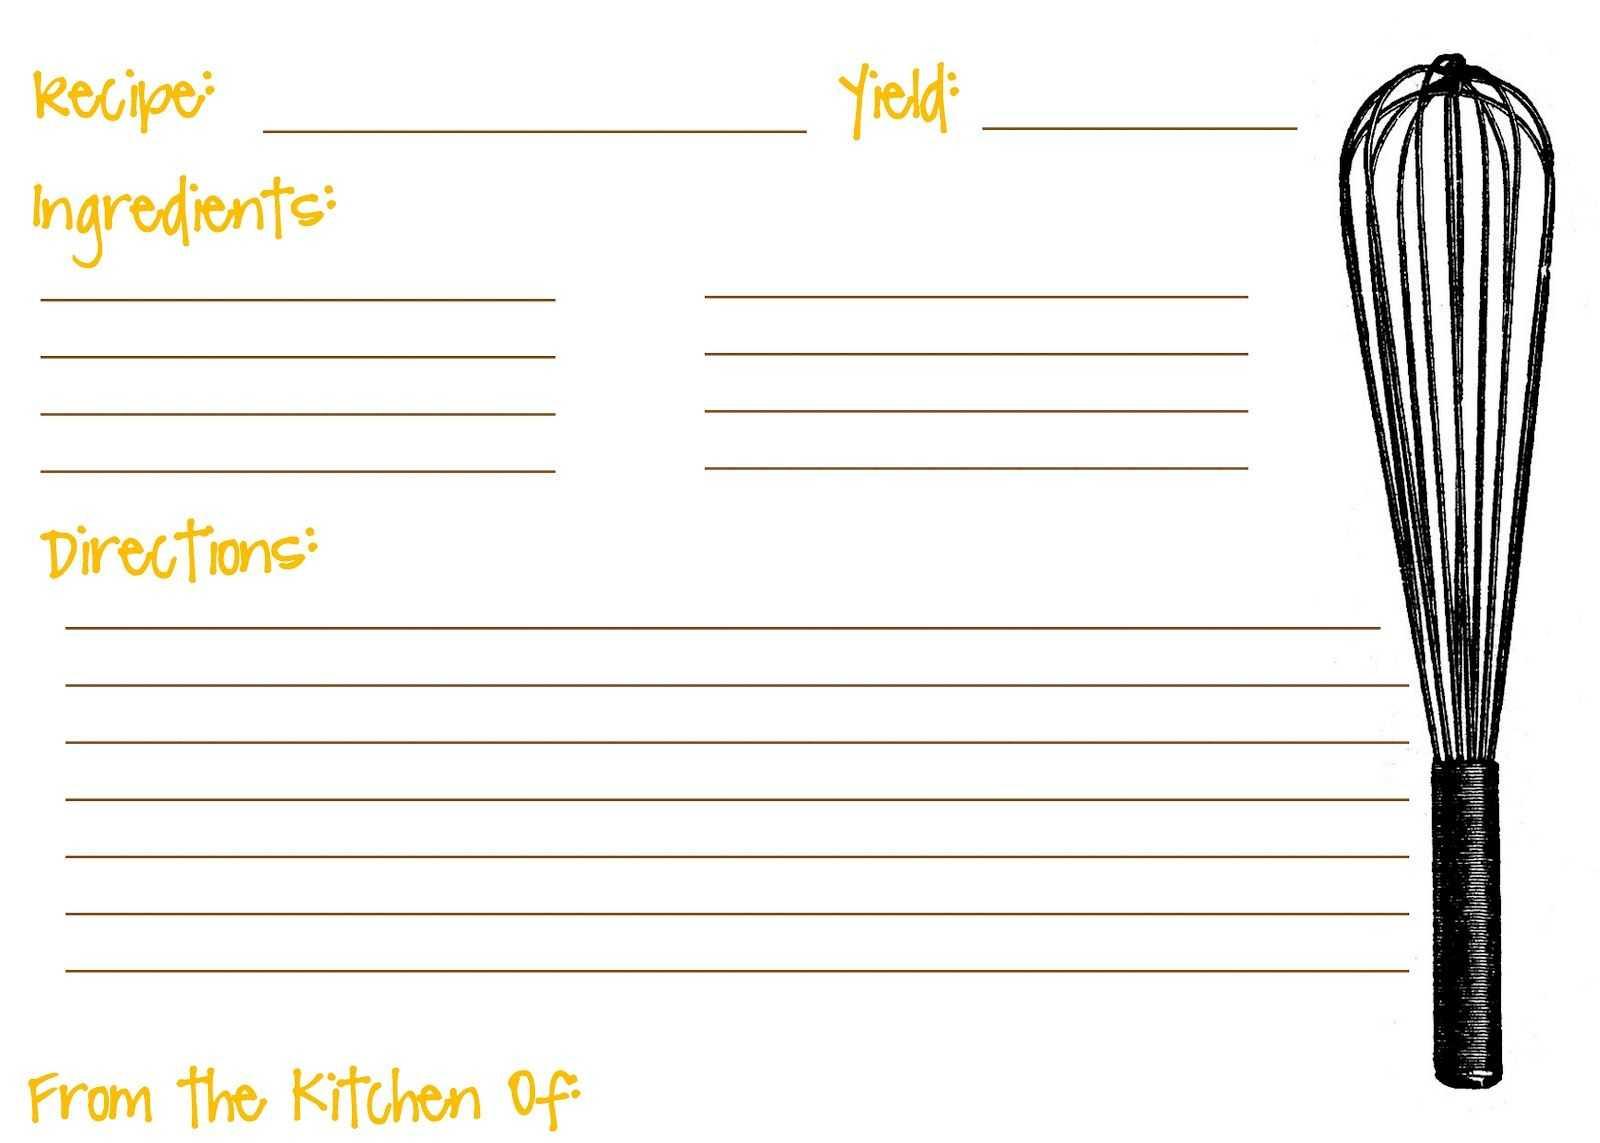 Printable Recipe Cards For Kids Recipe Template For Kids With Full Page Recipe Template For Word